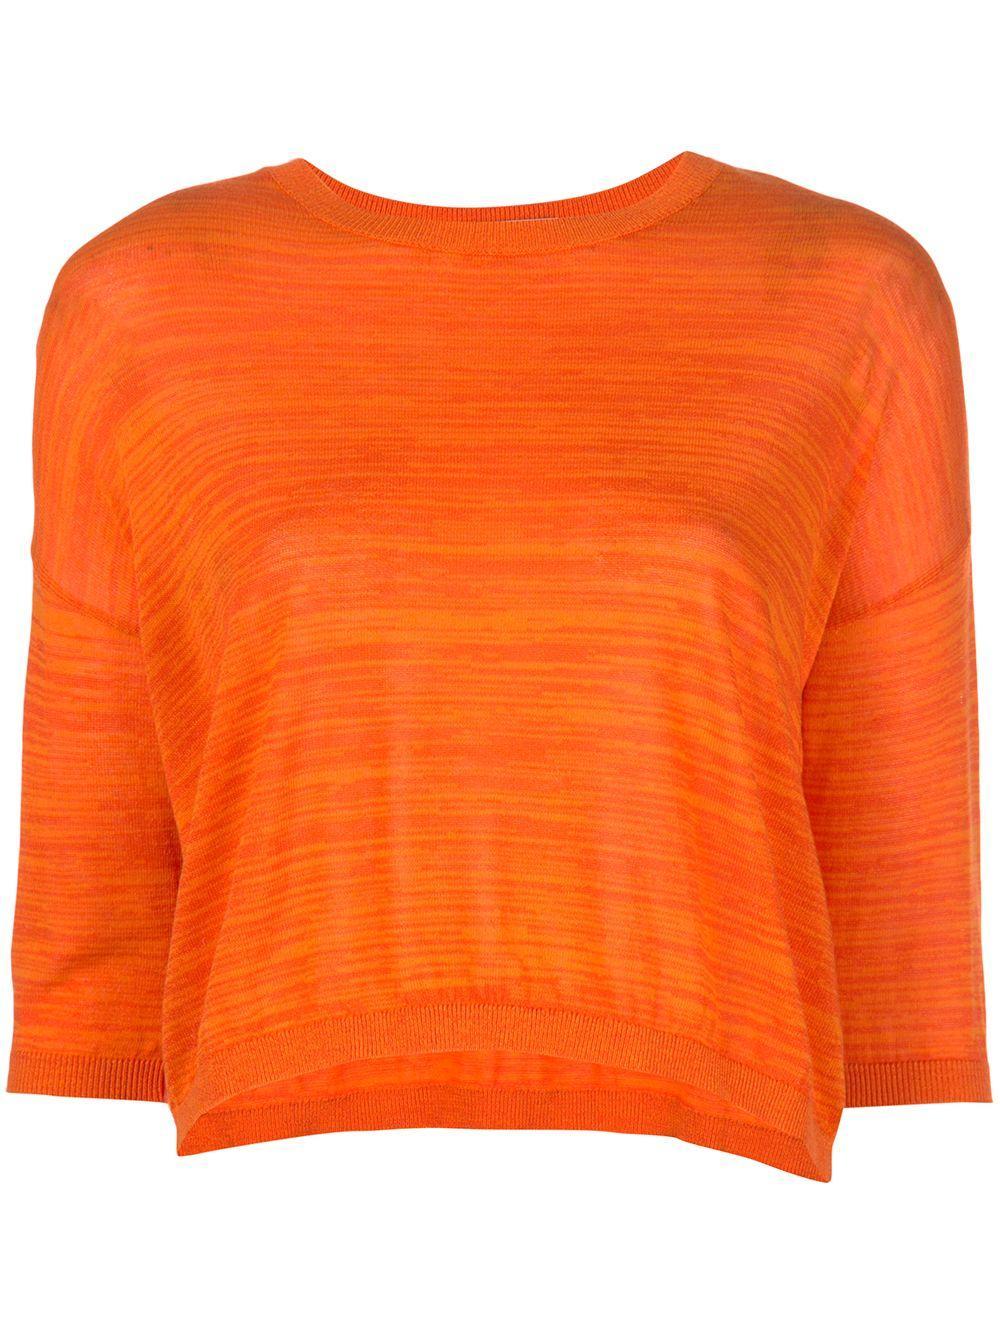 Celica Half Sleeve Knit Top Item # 20934